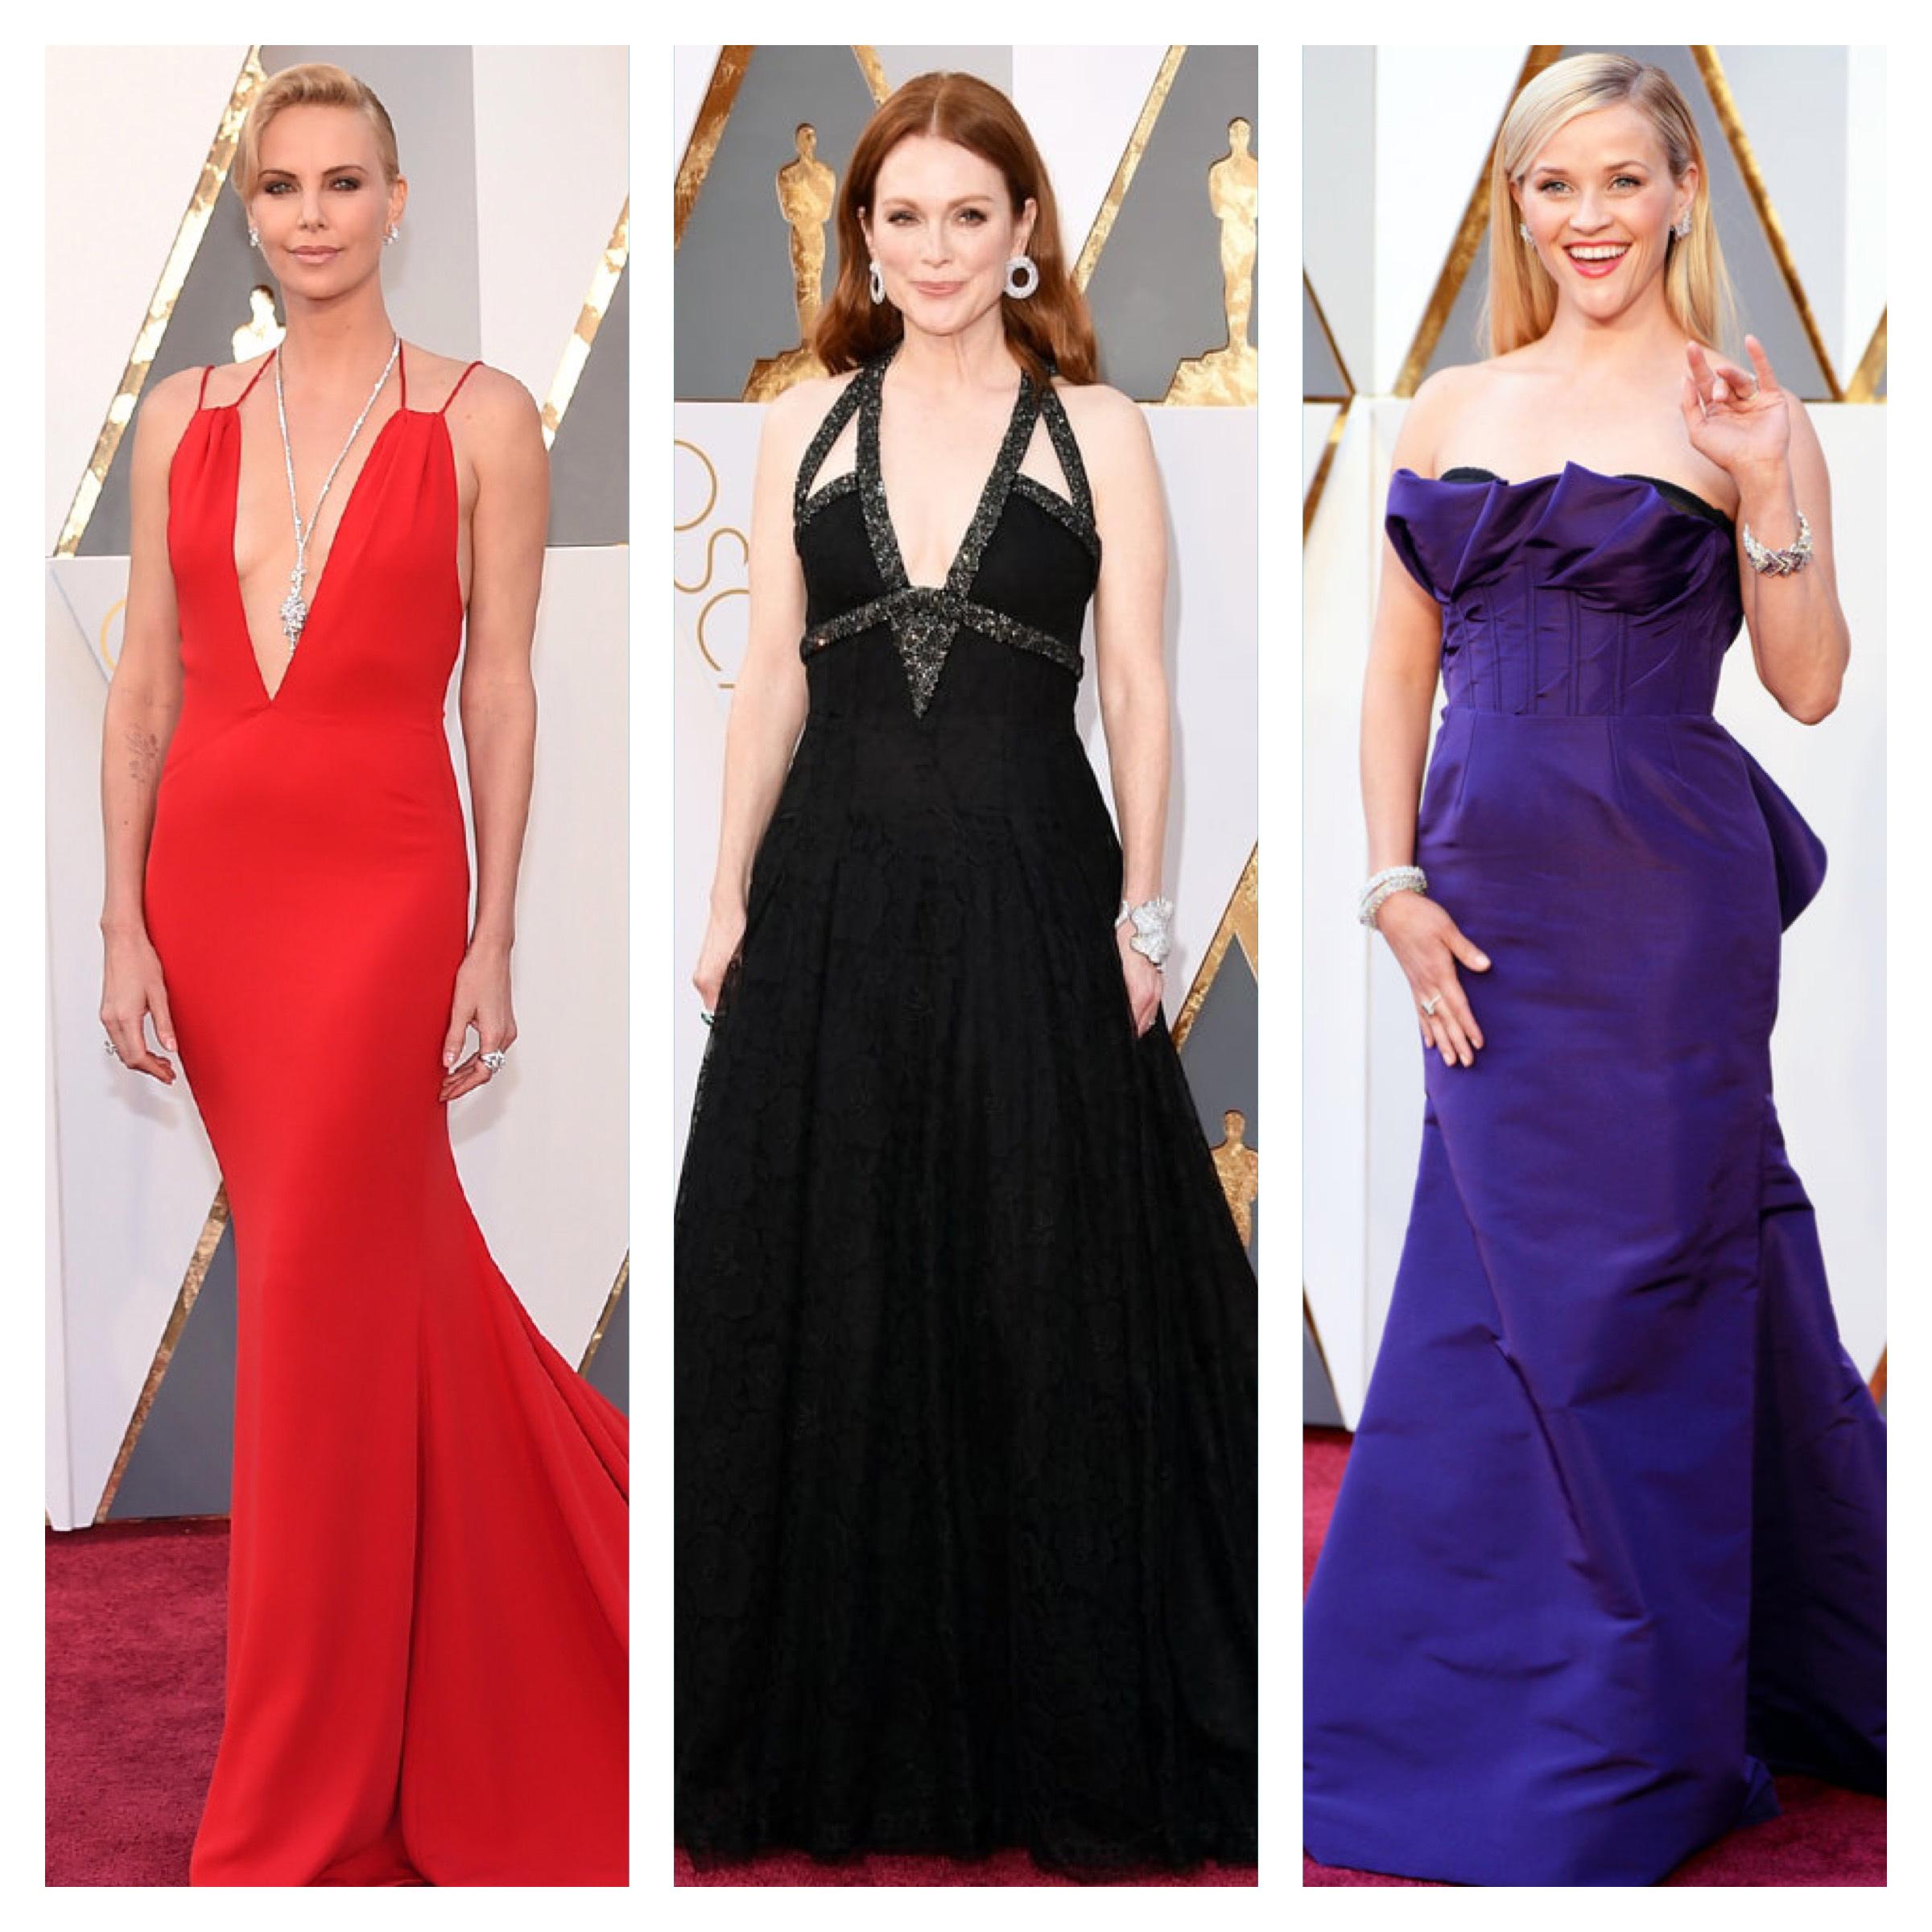 7c354208d003c 2016 Oscars  Team Fremar - The Dress DownThe Dress Down